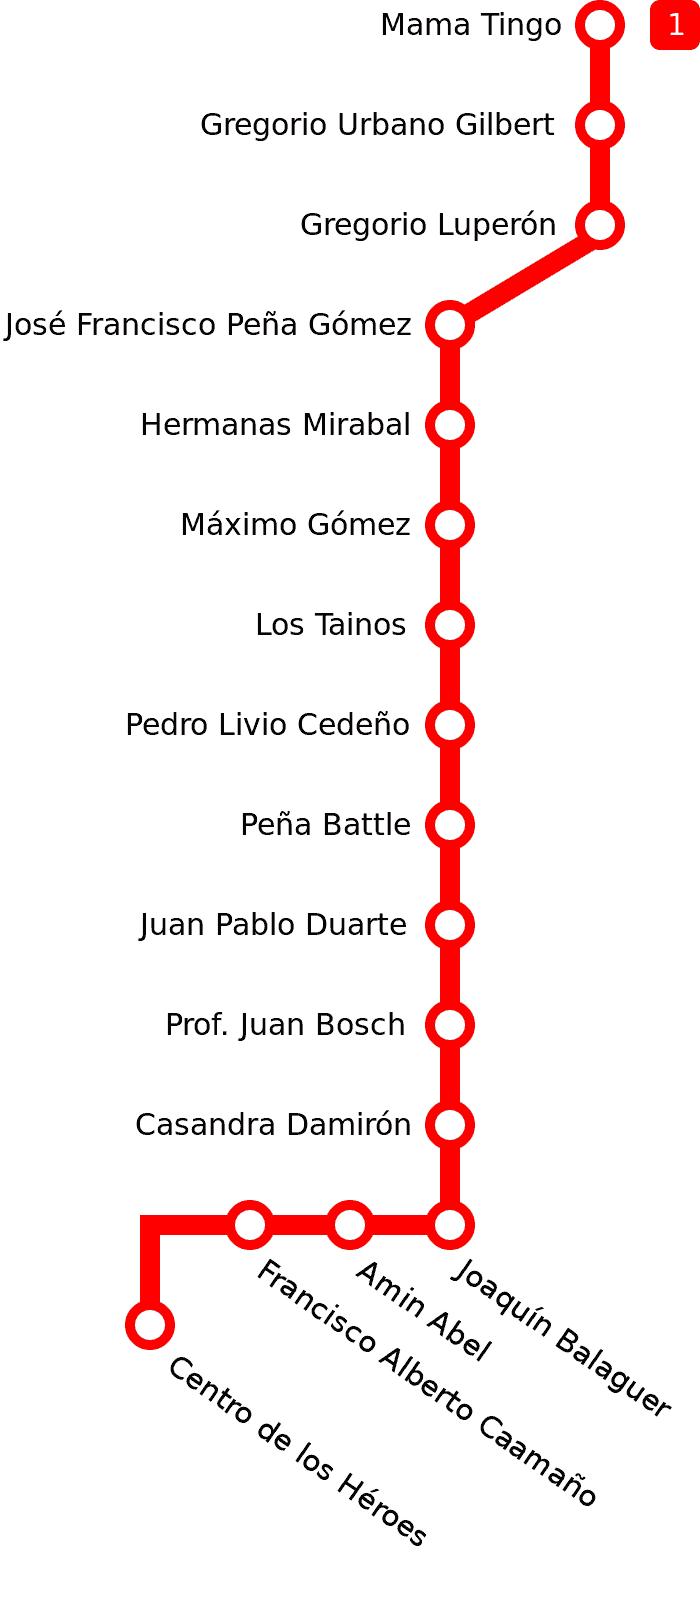 Santo Domingo Metro Map.Subway Map Of Santo Domingo Mapa Metro